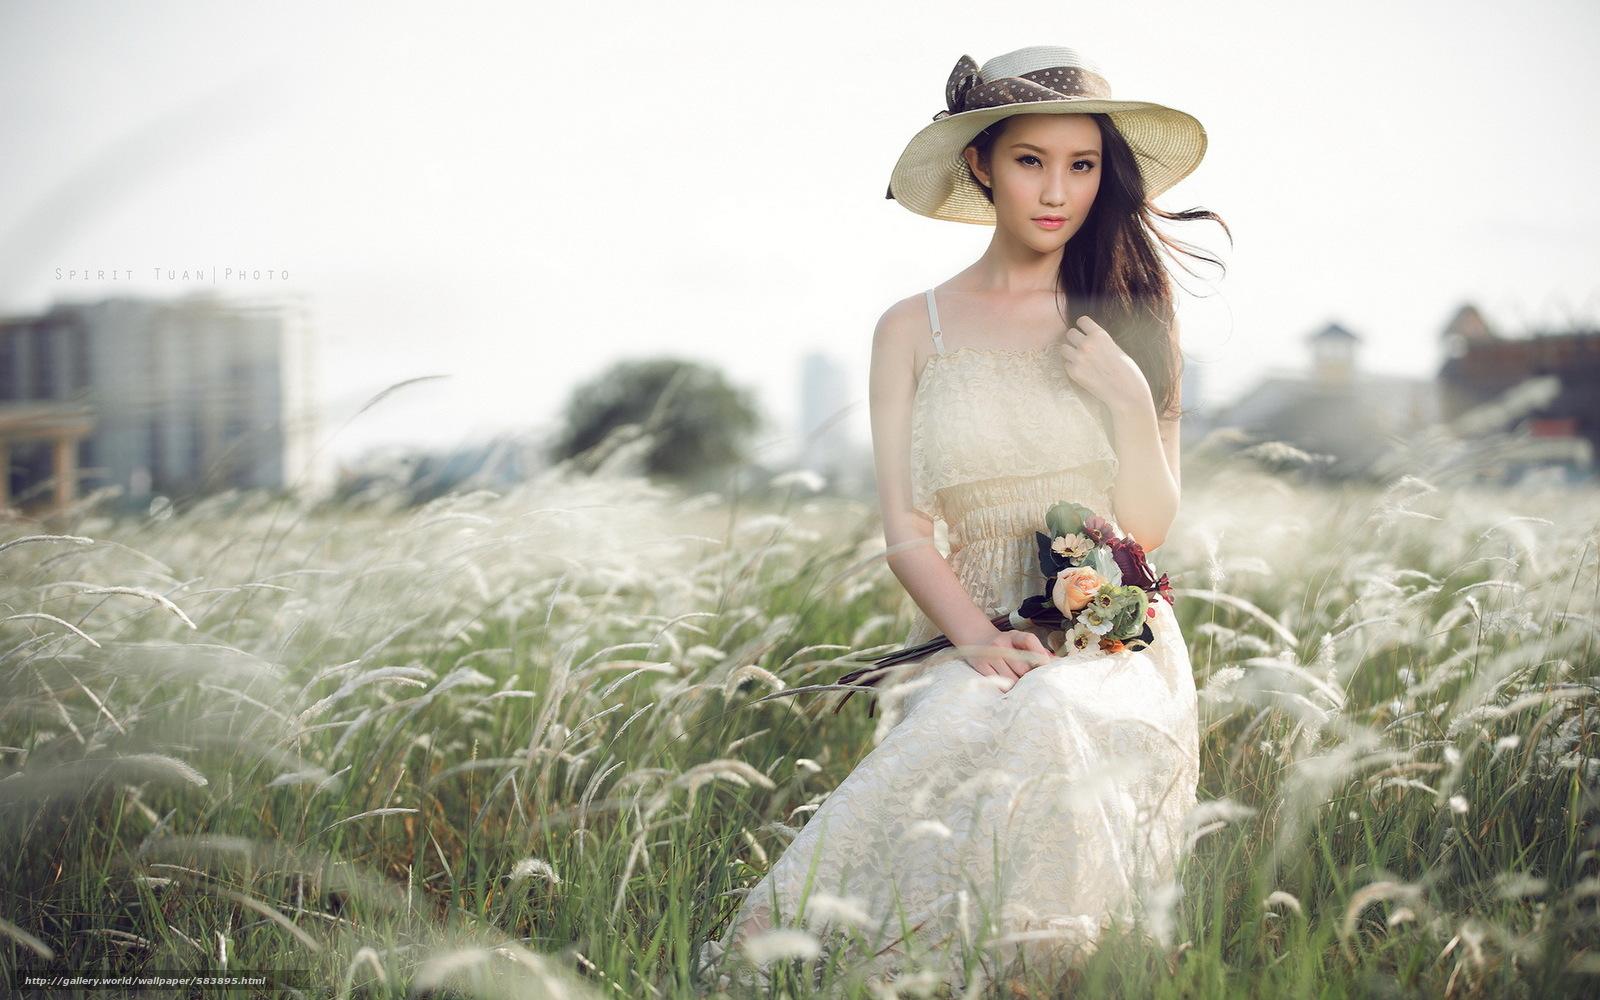 Азиатки бесплатно онлайн 5 фотография